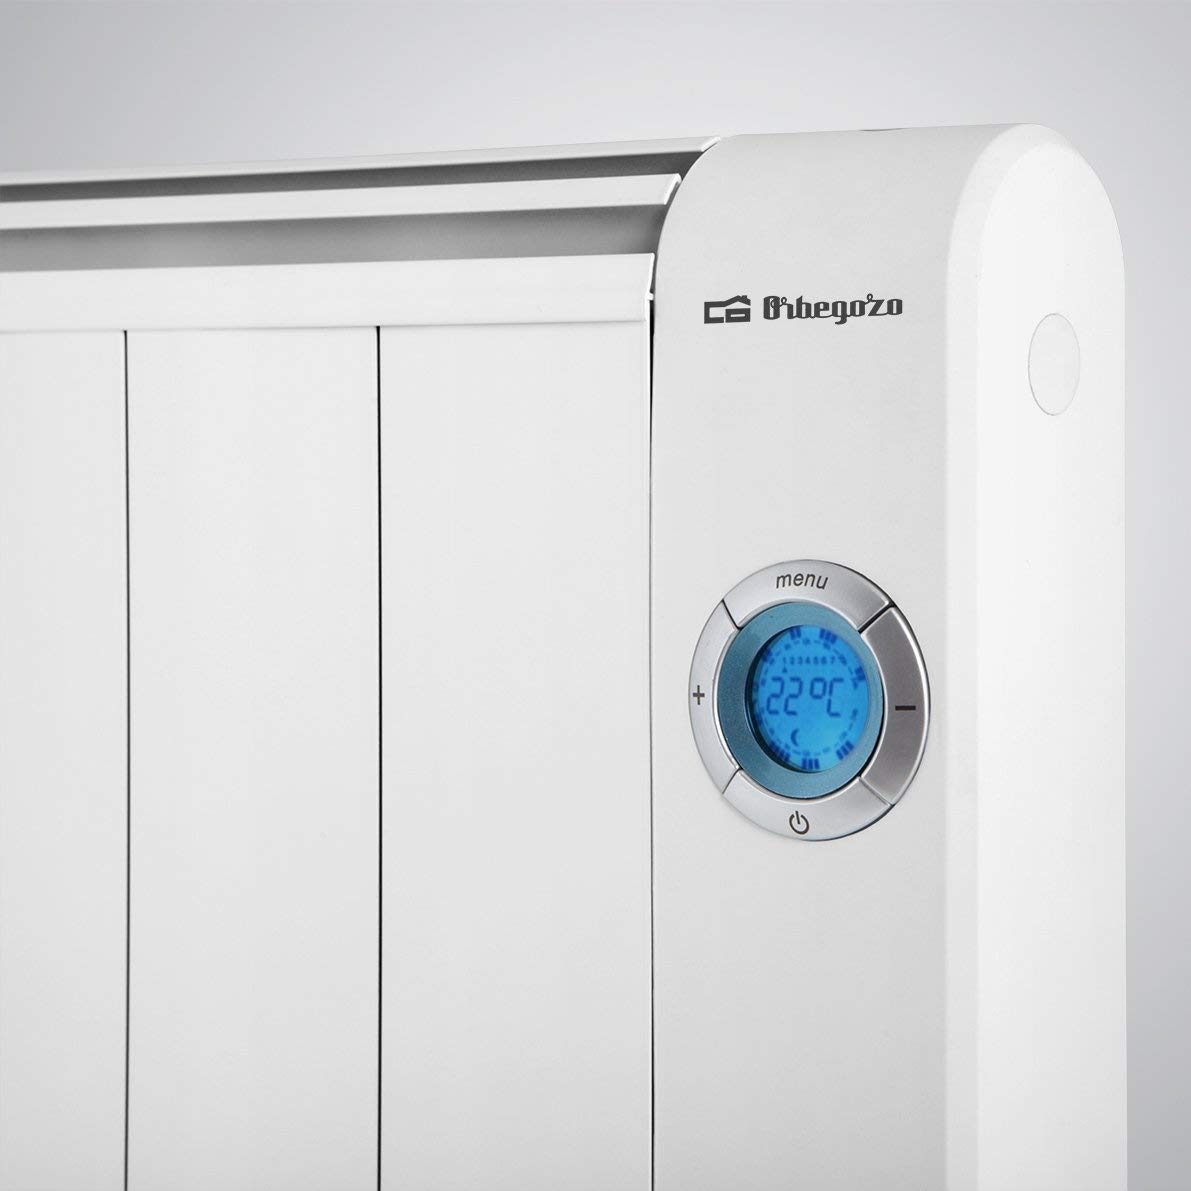 radiador electrico Orbegozo RRE 1510 detalle